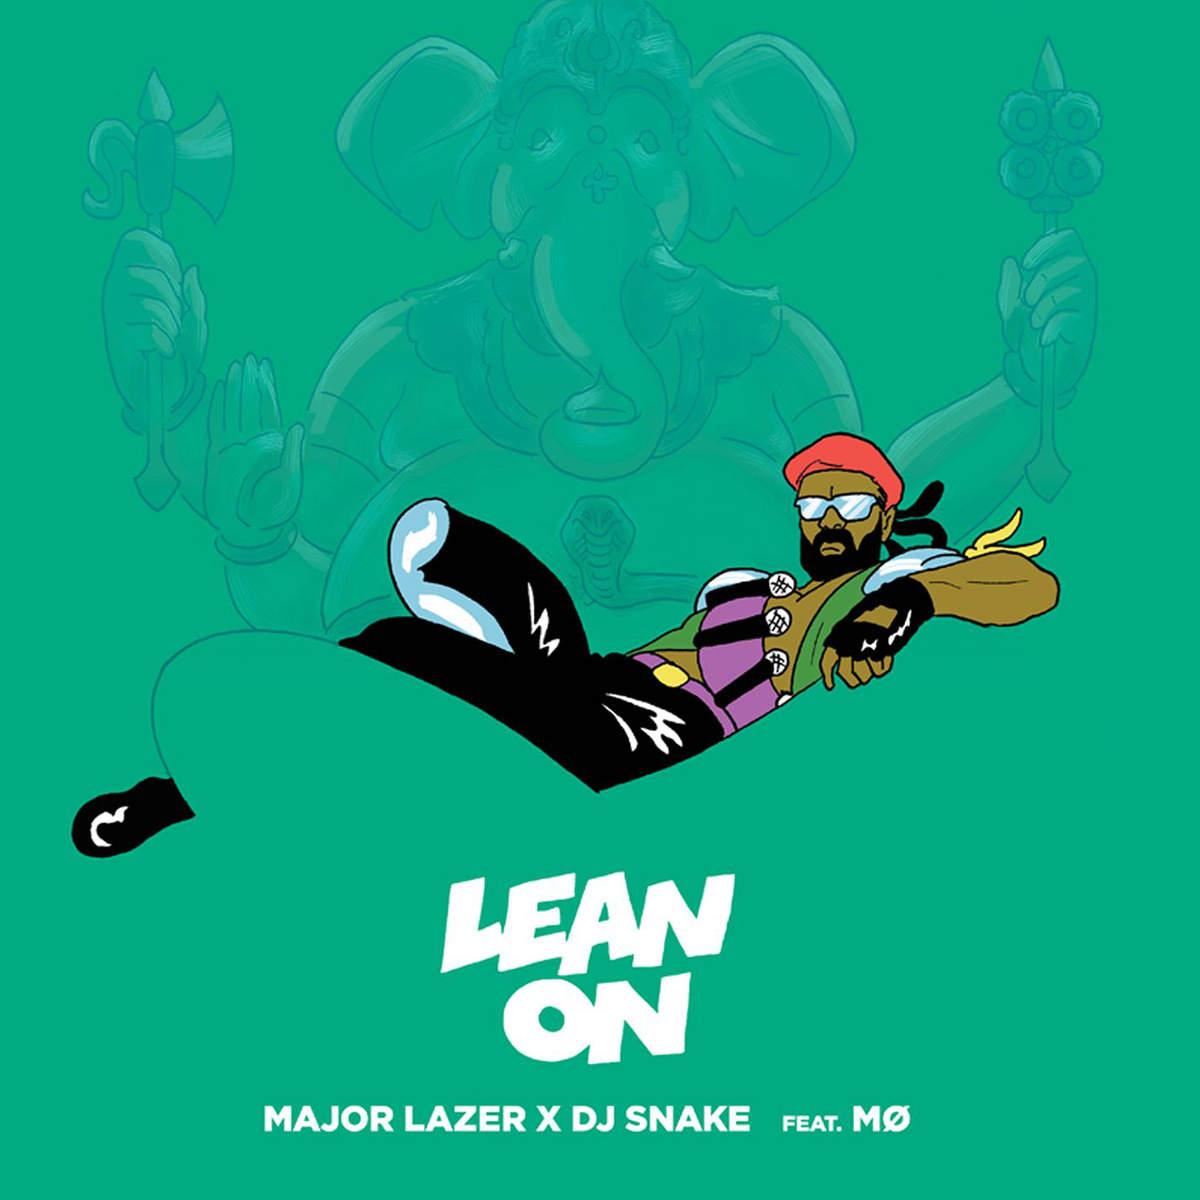 Major Lazer, Lean On, Mo, dancehall, moombahton